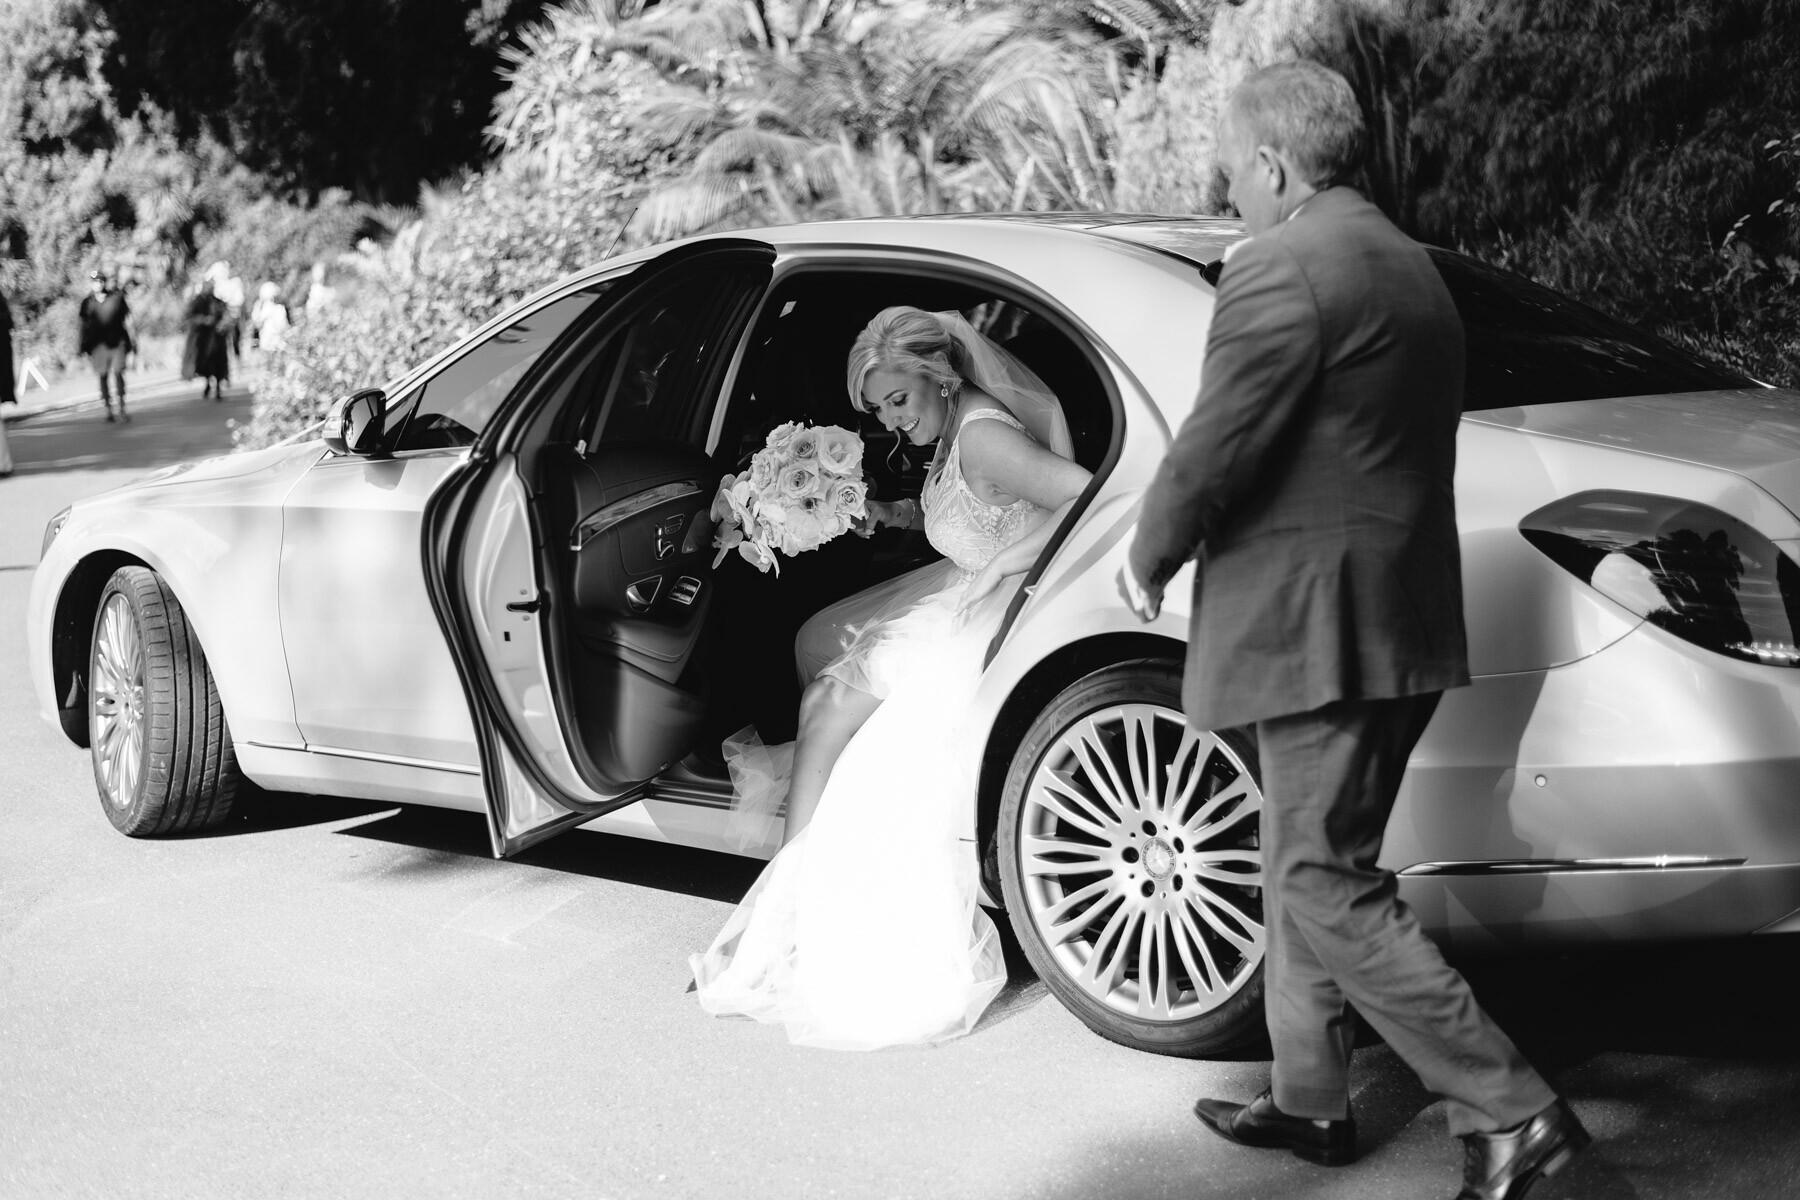 How long should wedding photos take?